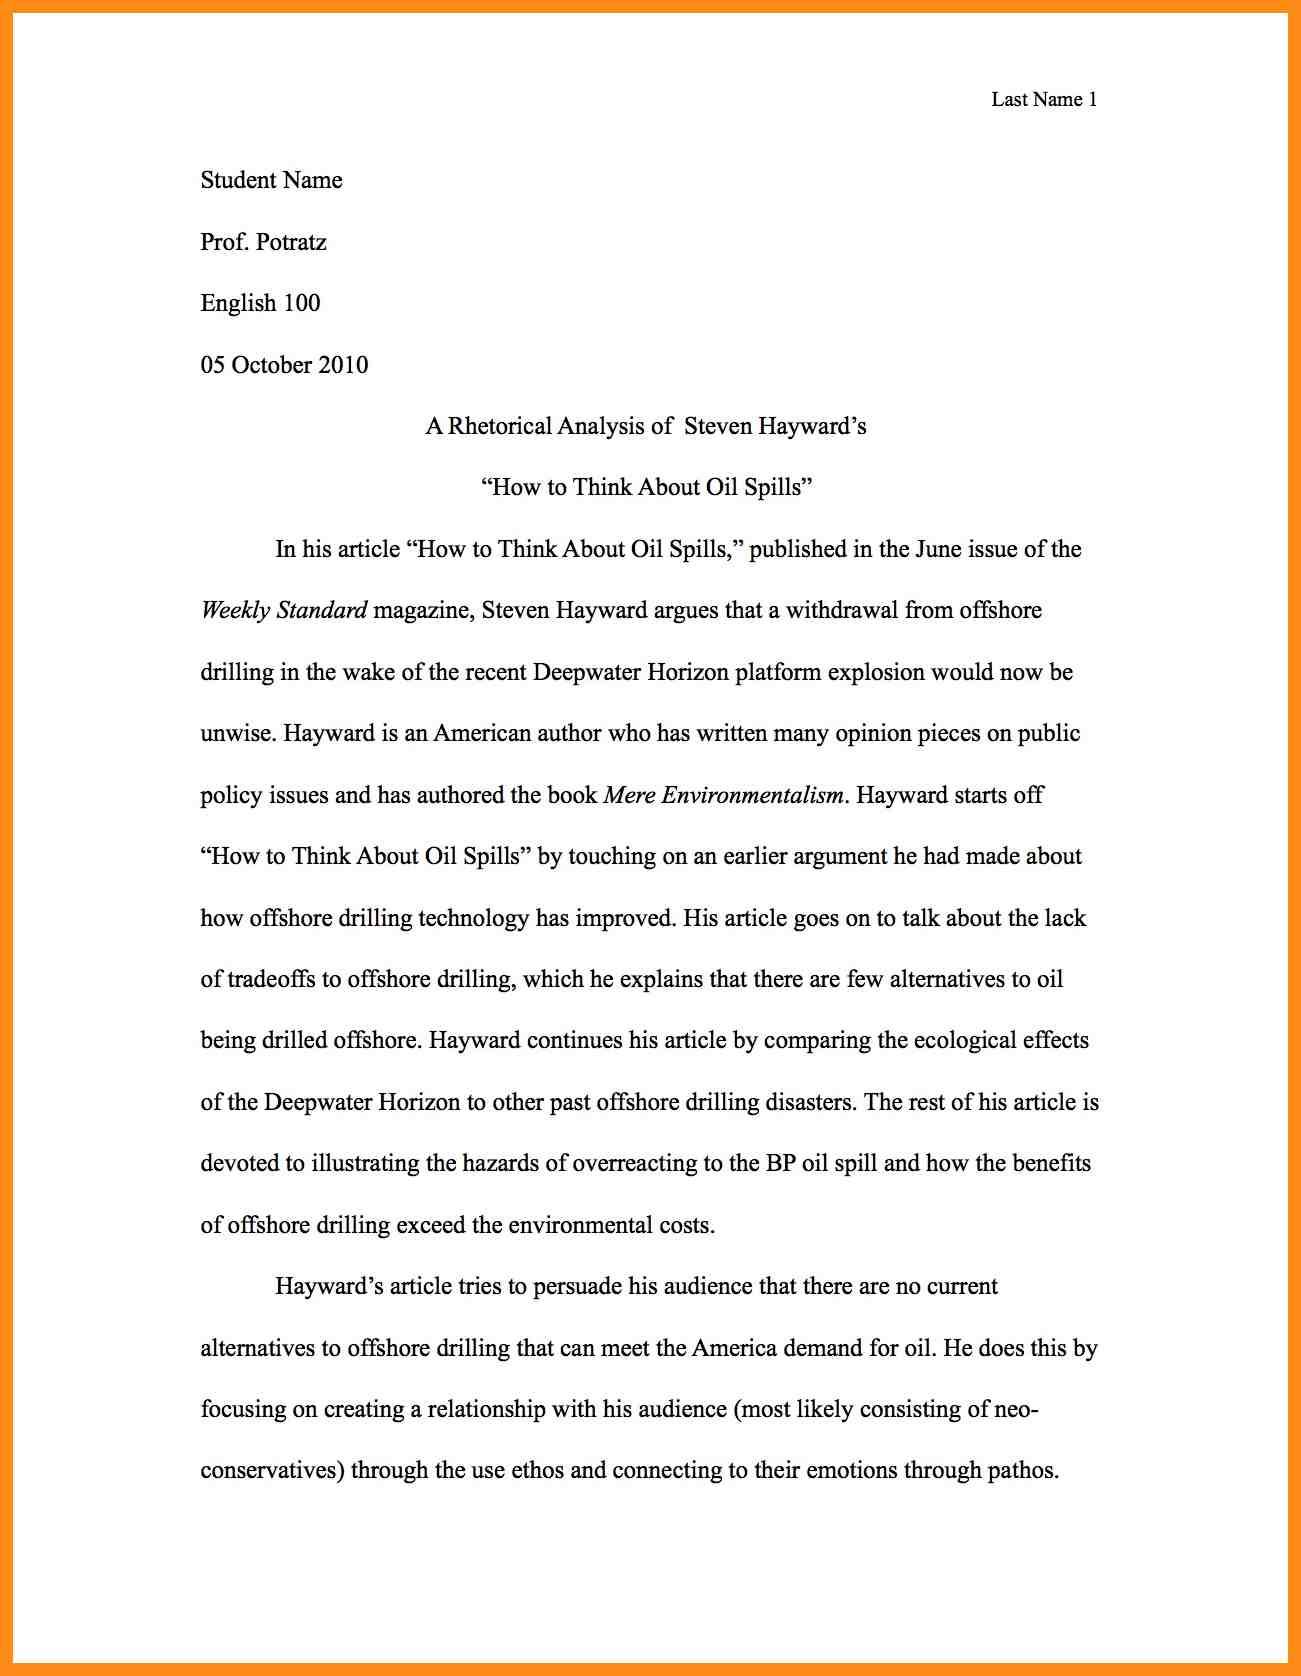 001 Write Best Rhetorical Analysis Essay Example Of Using Ethos Pathos And Logos Pdf Unusual Examples Ap Lang Strategies Full